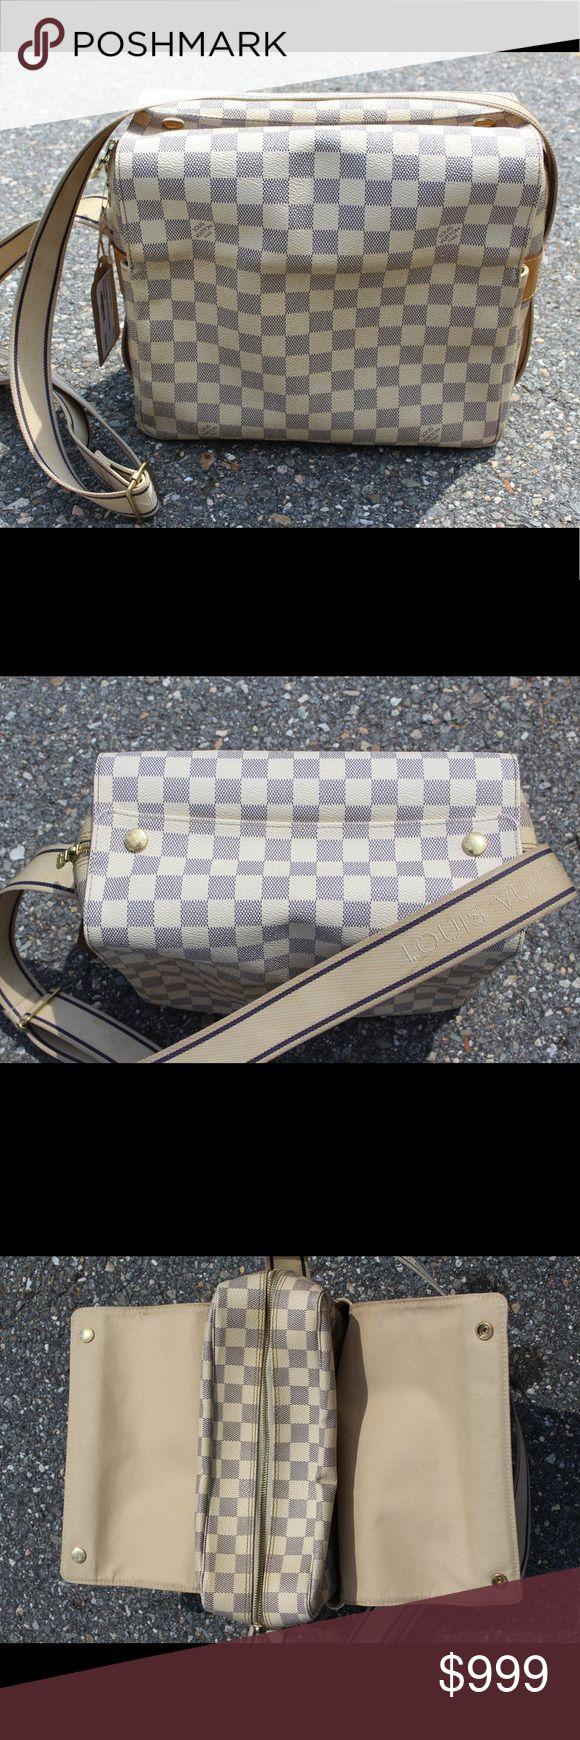 Louis Vuitton Damier Navigilo Messanger Bag Excellent condition - light wear - Price firm no trades - buy for less & more pics at www.chicboutiqueconsignments.com! MA's #1 designer consignment boutique! Louis Vuitton Bags Crossbody Bags